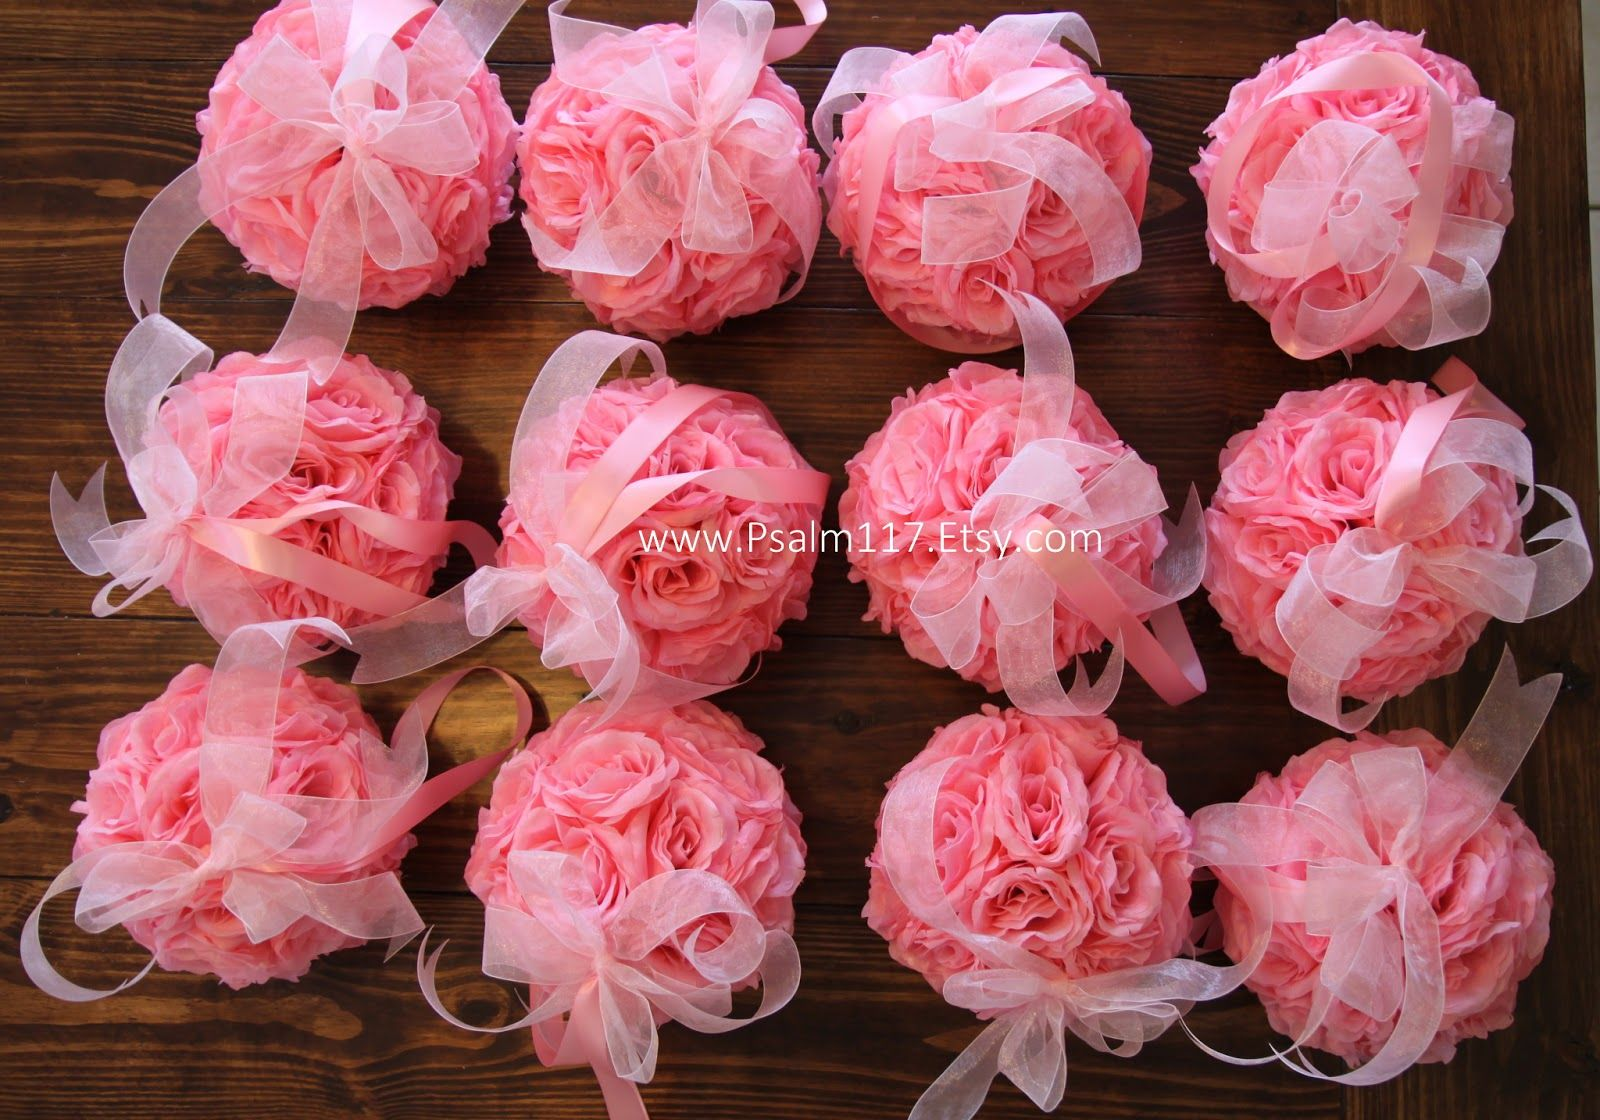 custom+handmade+baby+pink++8+inch+wedding+pomander+kissing+ball+pom+pom+Psalm117.Etsy.com+Psalm+117+wedding+isle+decoration+church+pew+decoration+ceremony+decoration+4.JPG (1600×1120)